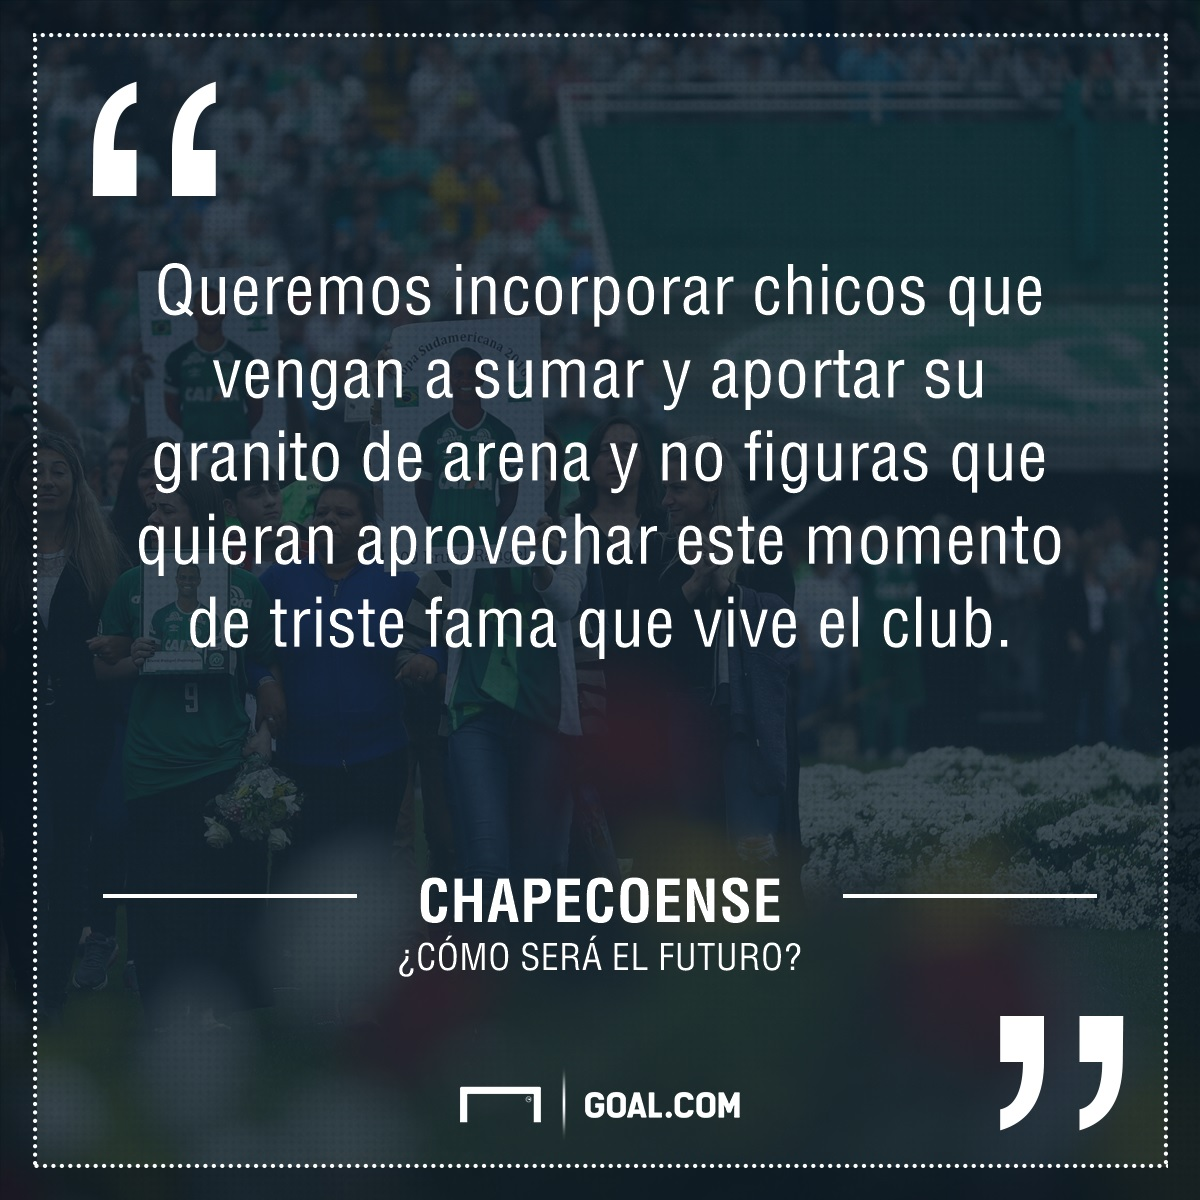 Chapecoense no quiere estrellas que se aprovechen del momento